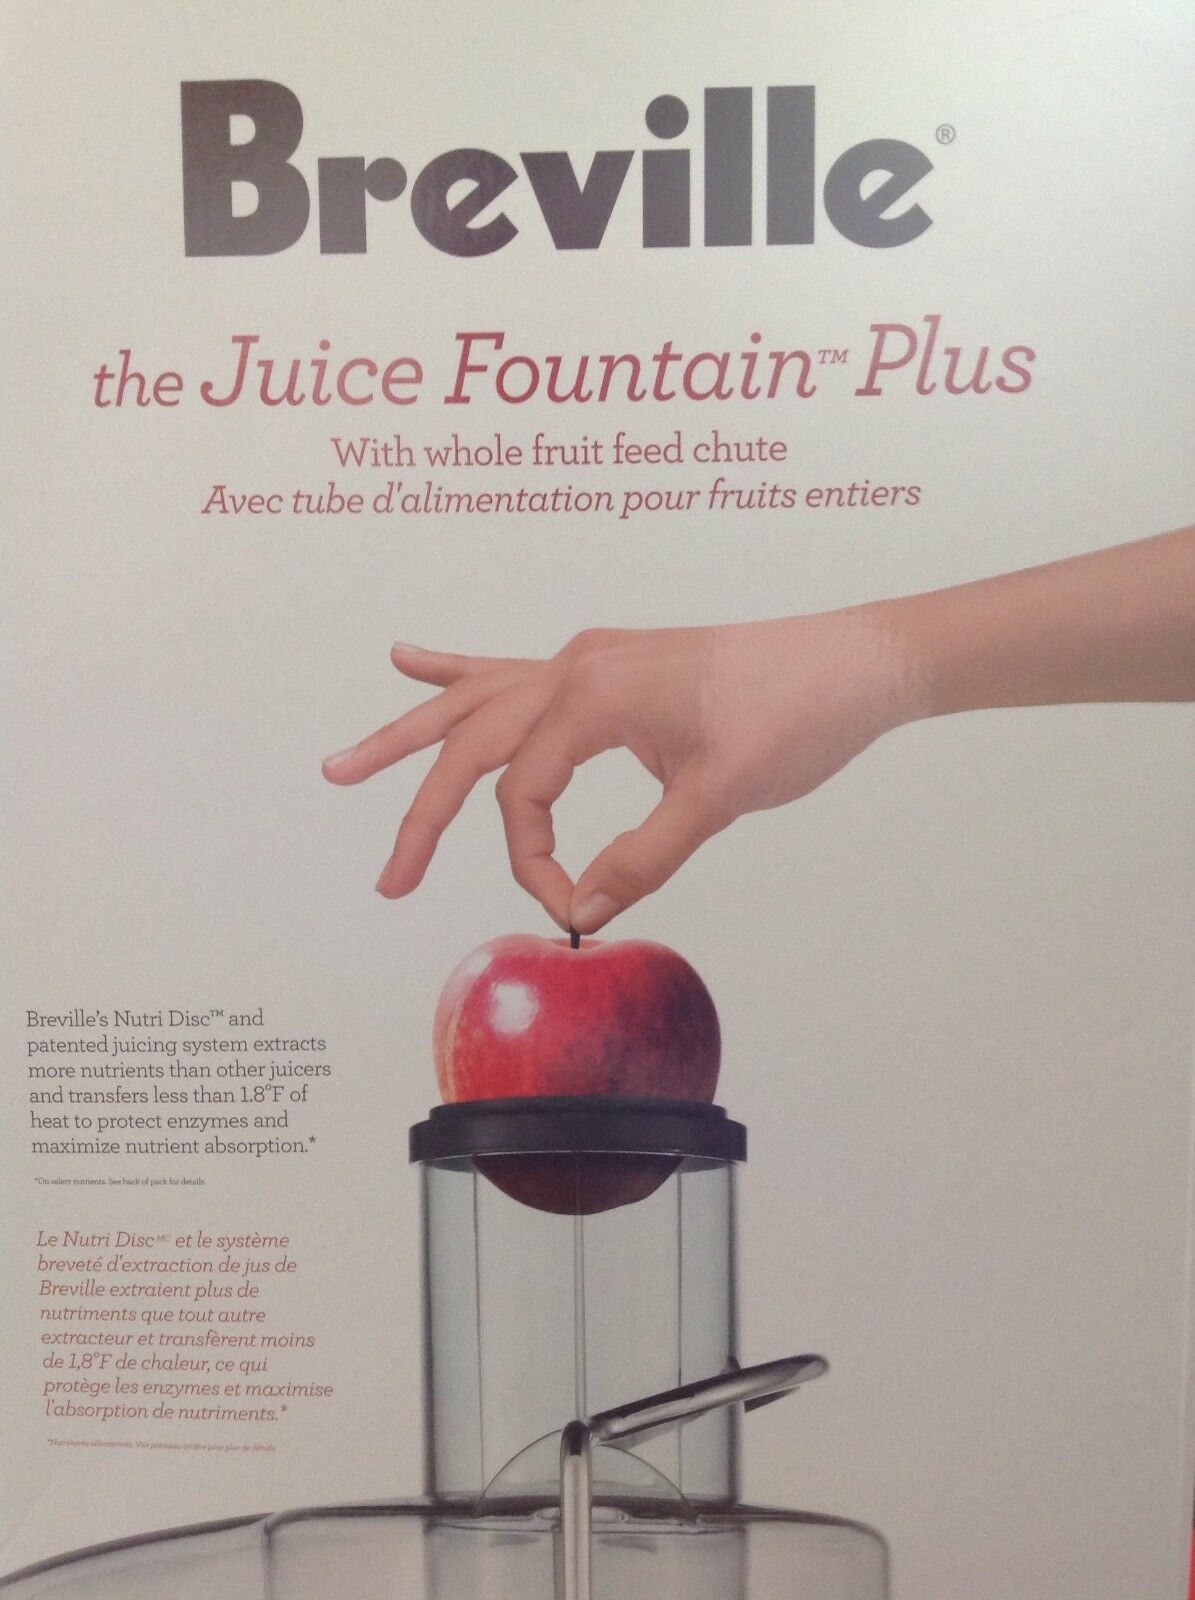 New Breville Grey Juice Fountain Plus